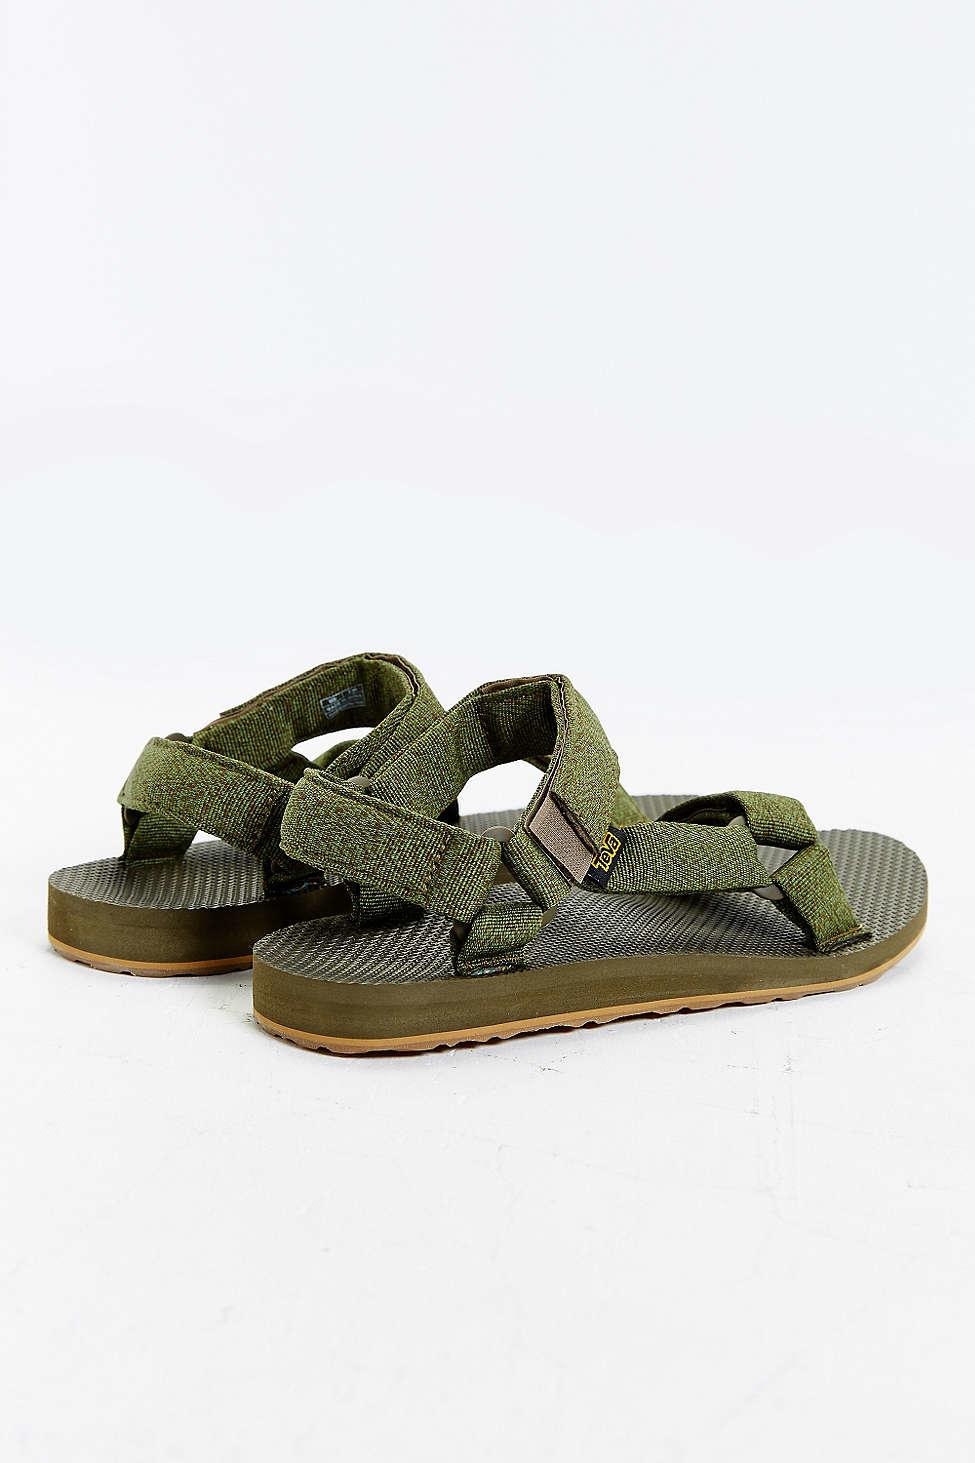 d79cfa5b83ae4e Lyst - Teva Original Universal Urban Men s Sandals in Green for Men